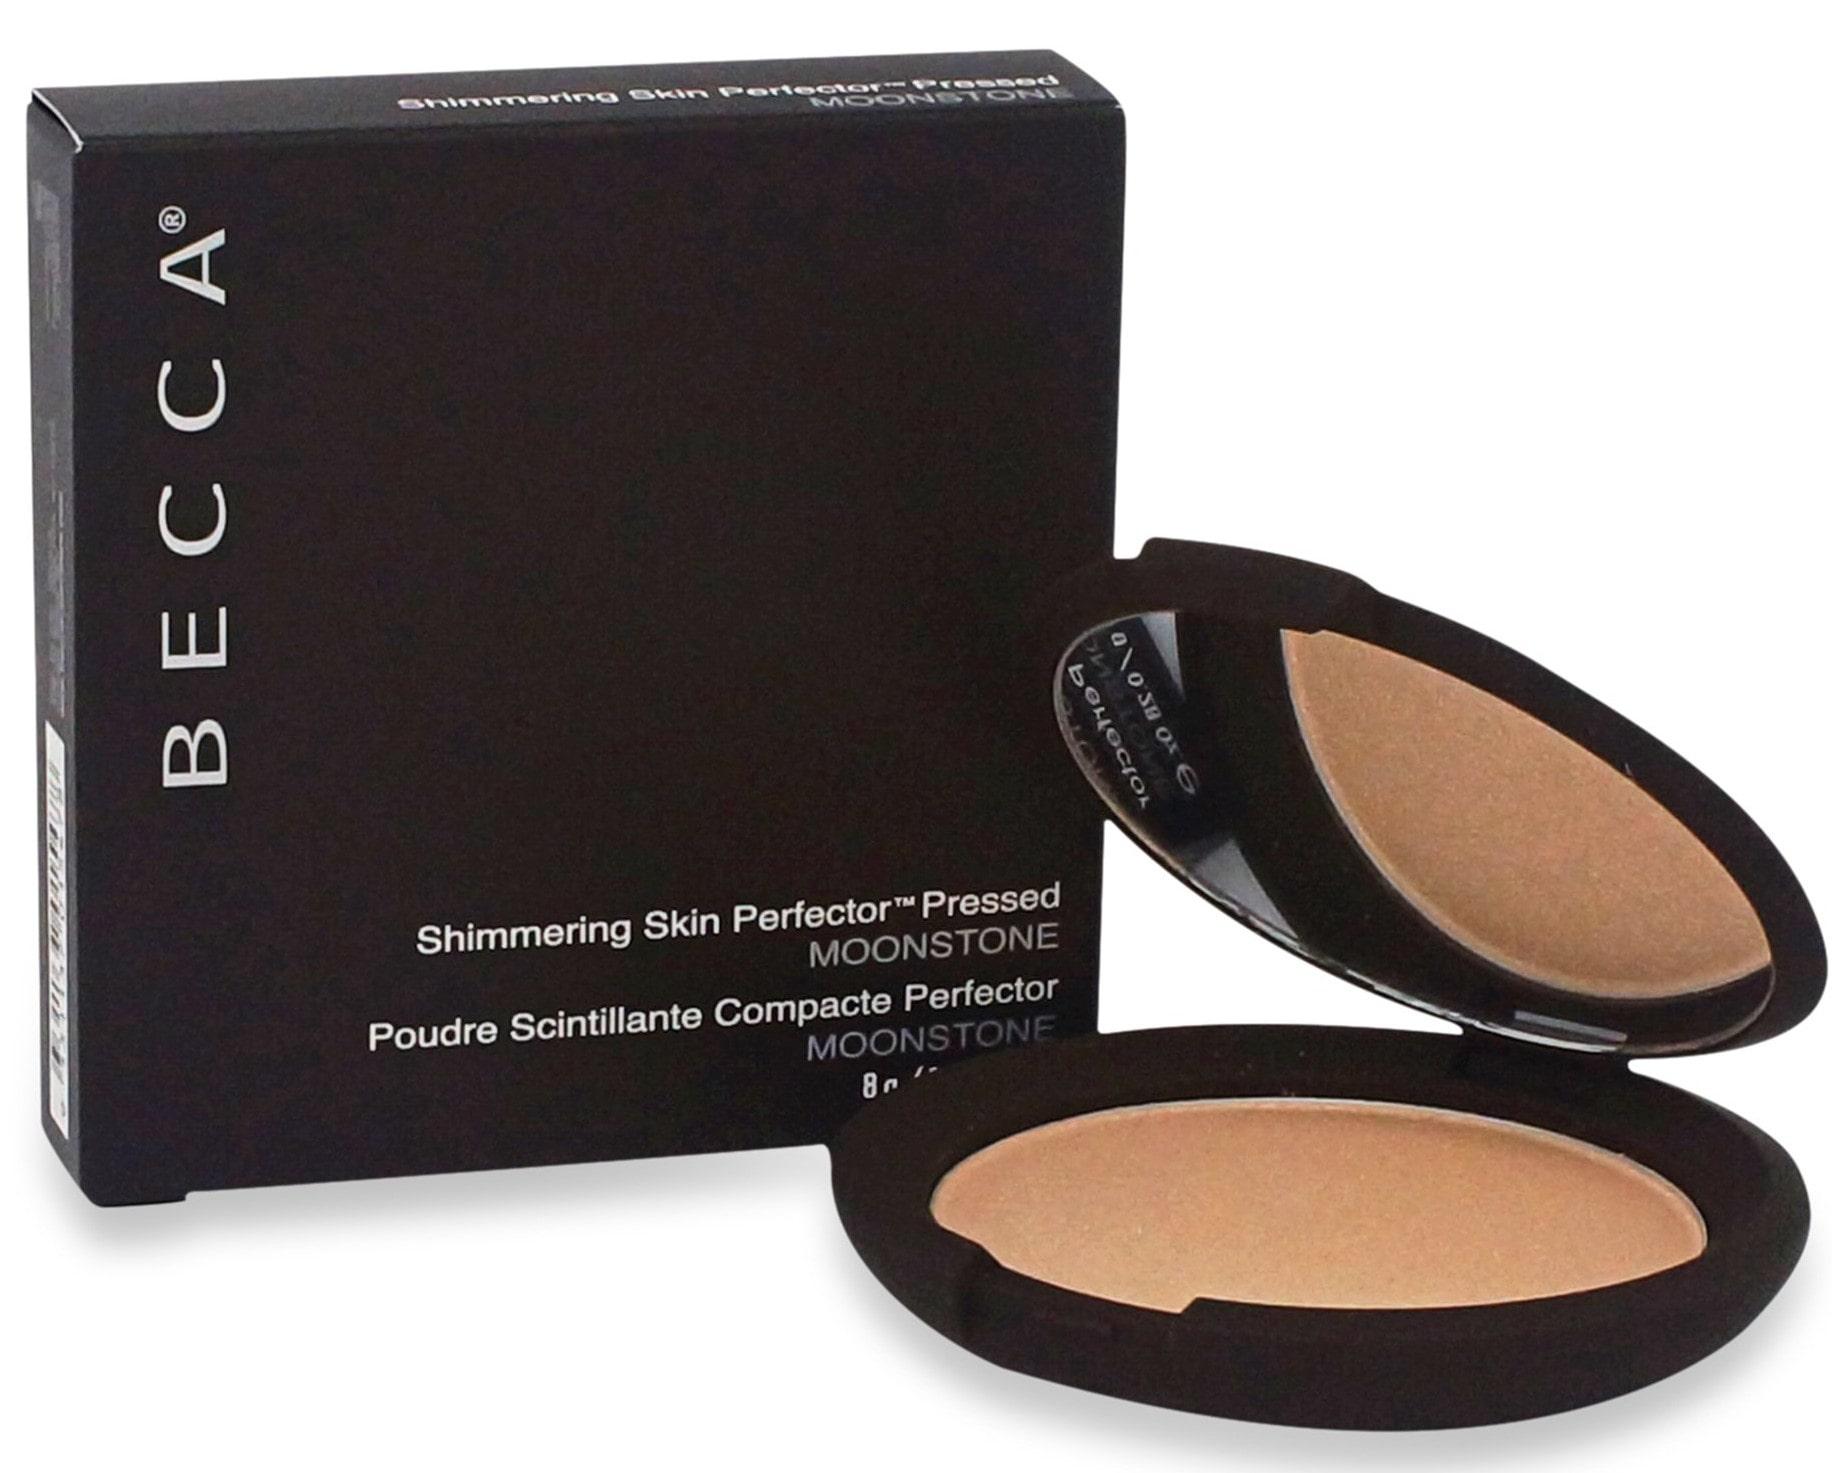 Becca Skin Perfector compact